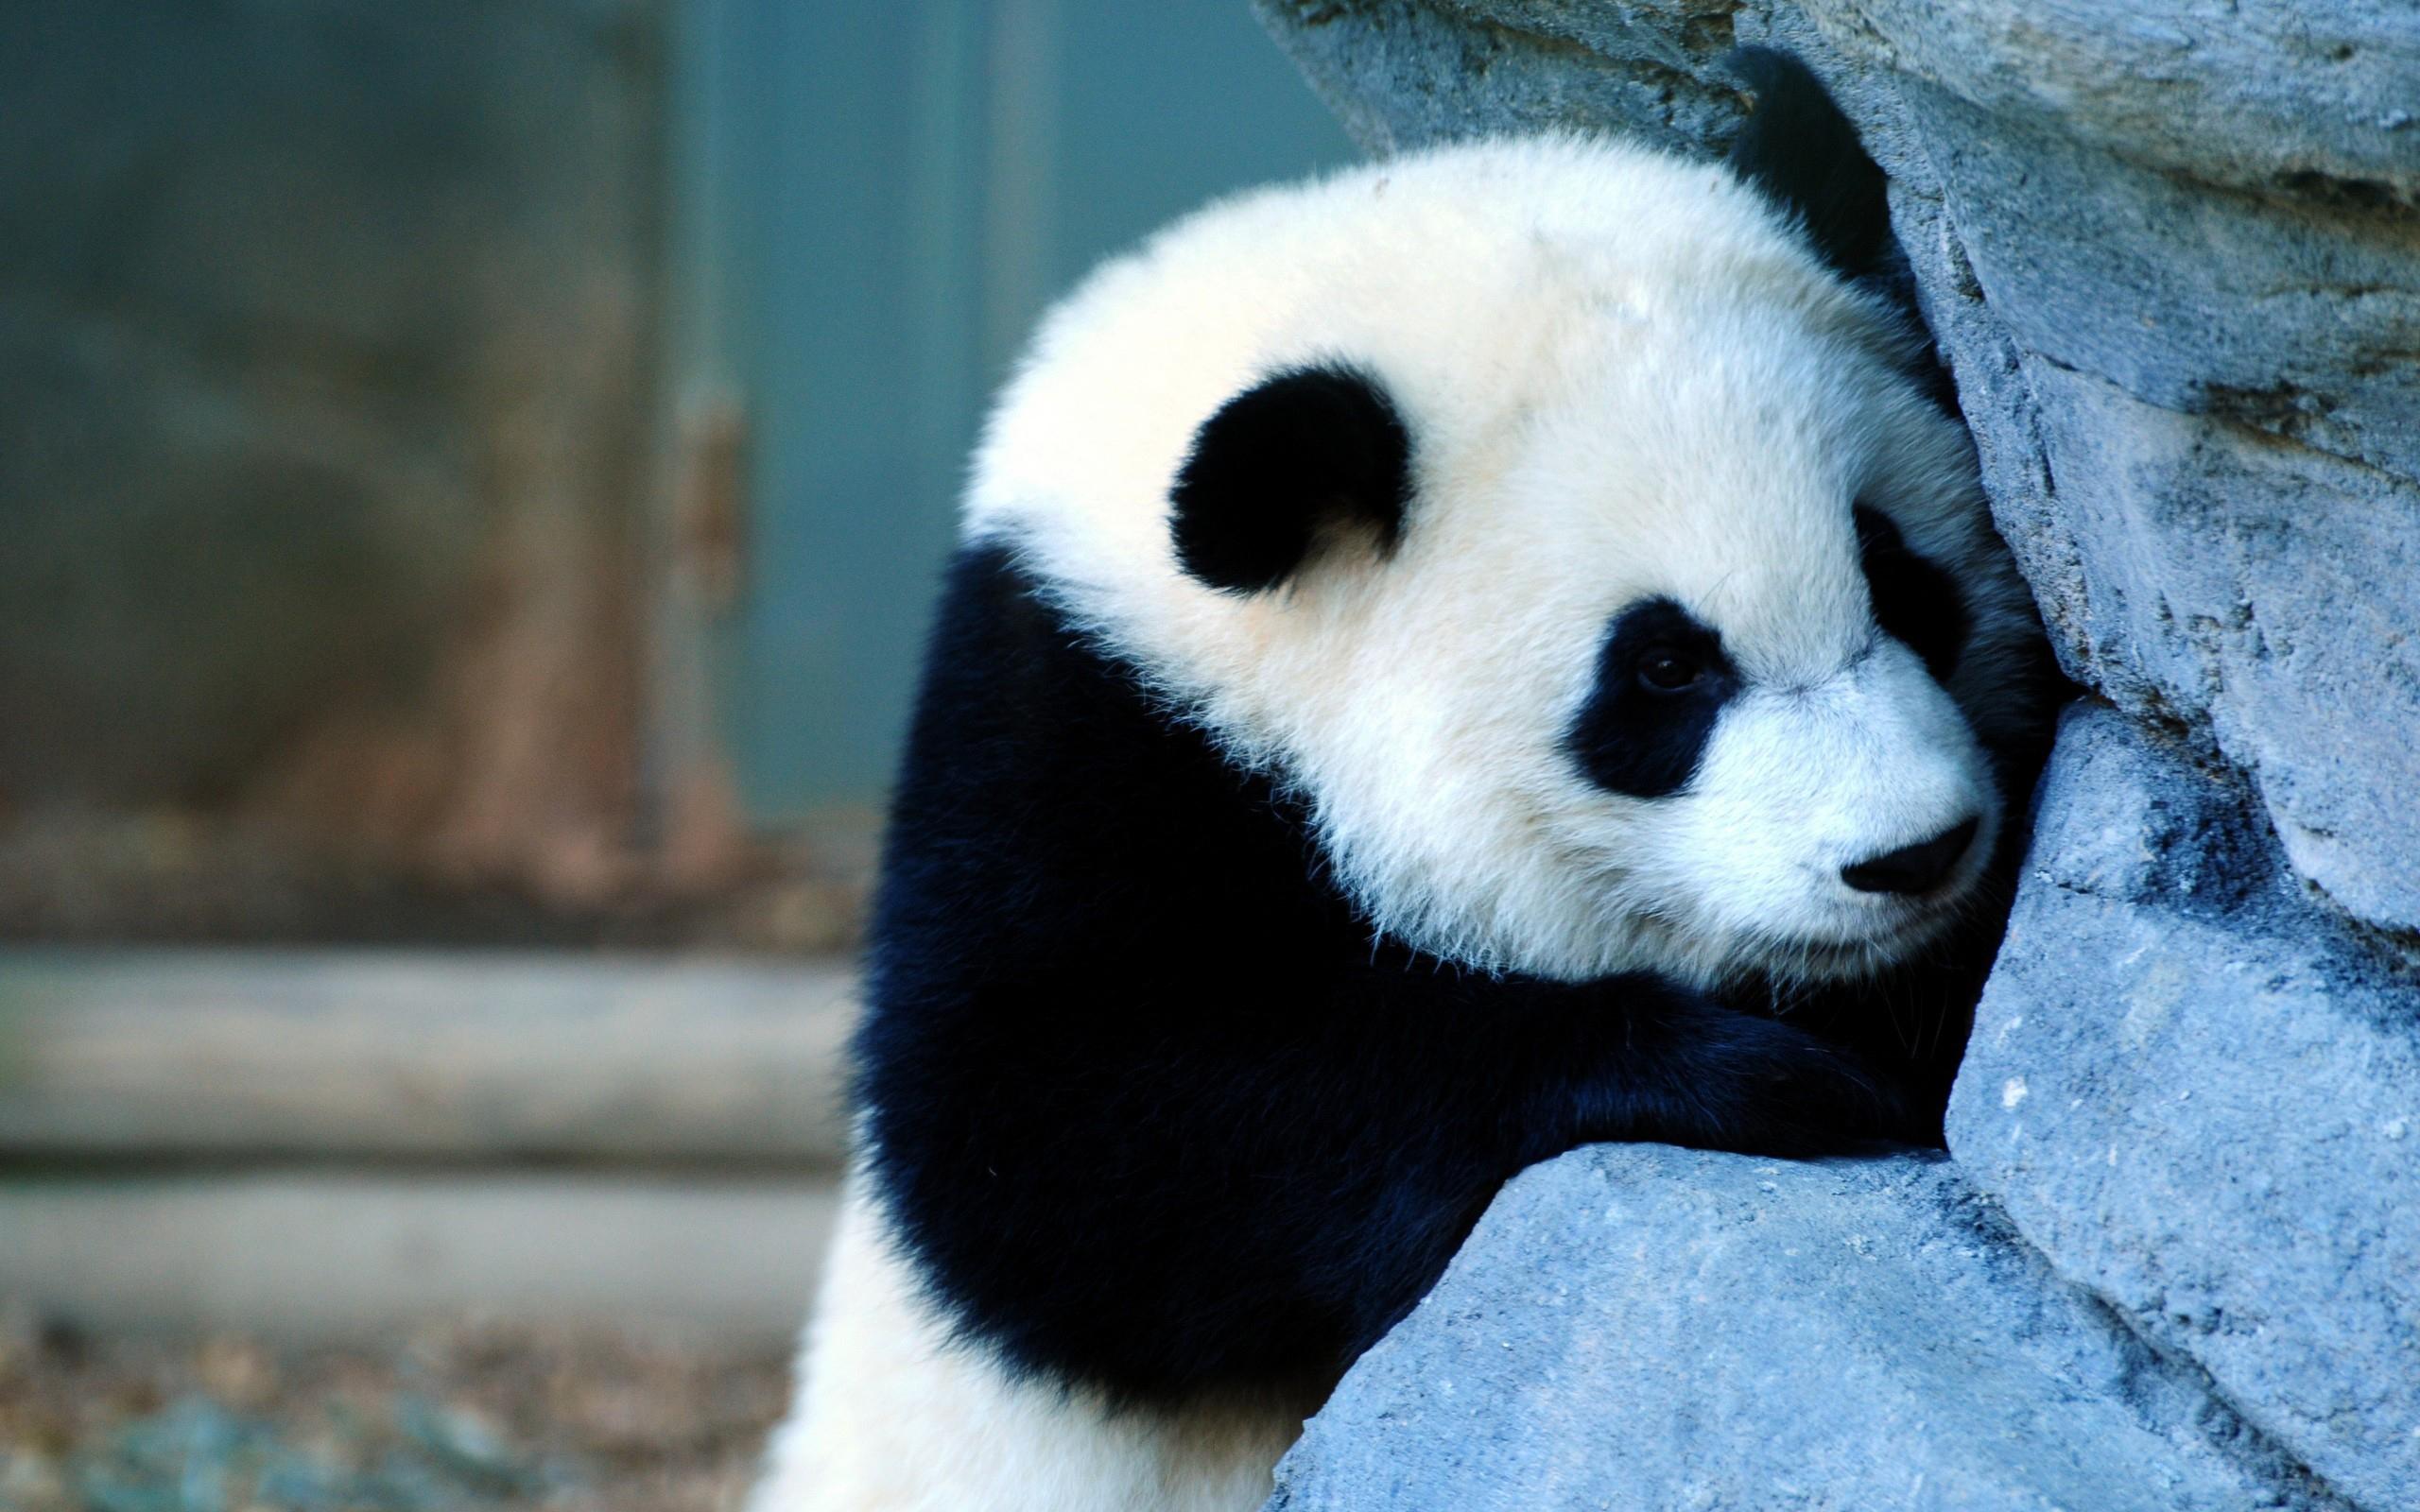 Ehentai wow panda gif nude pic